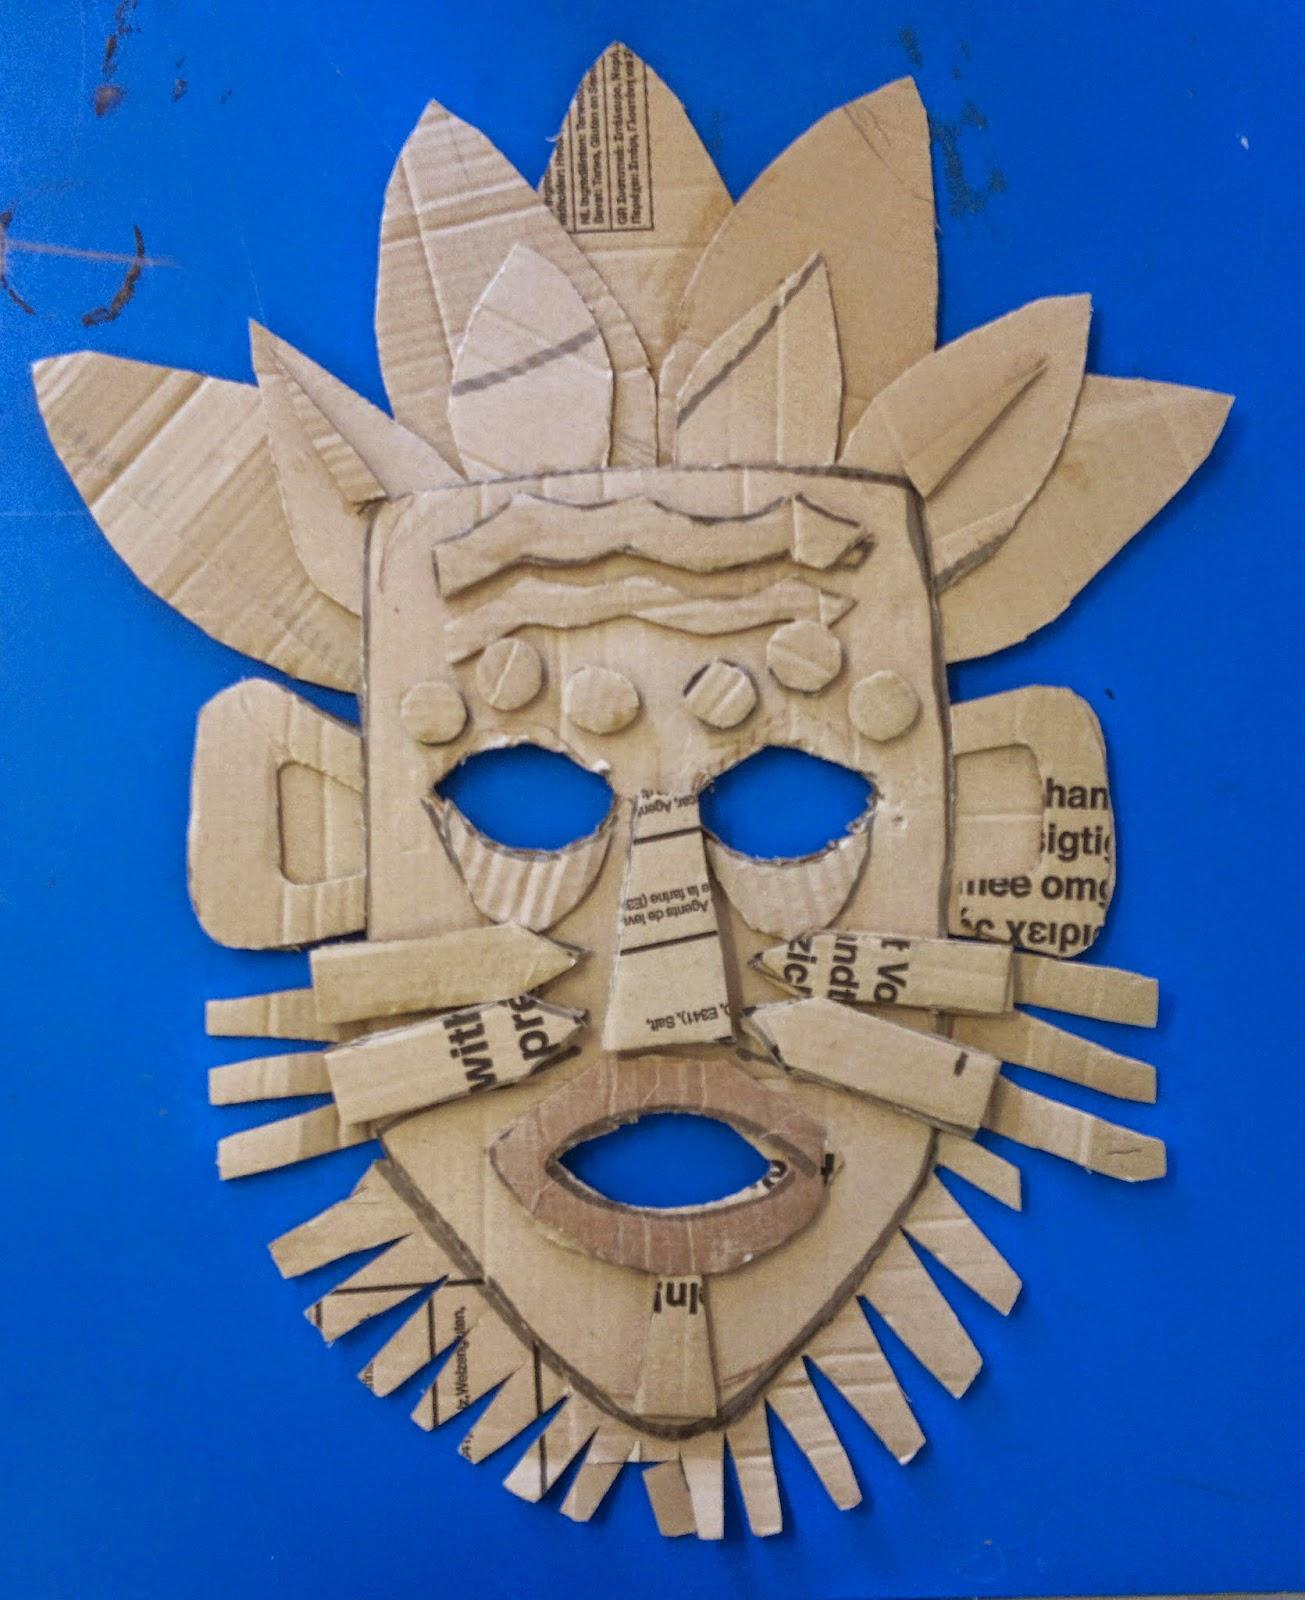 Diy Cardboard Masks: Art. Paper. Scissors. Glue!: African Mask